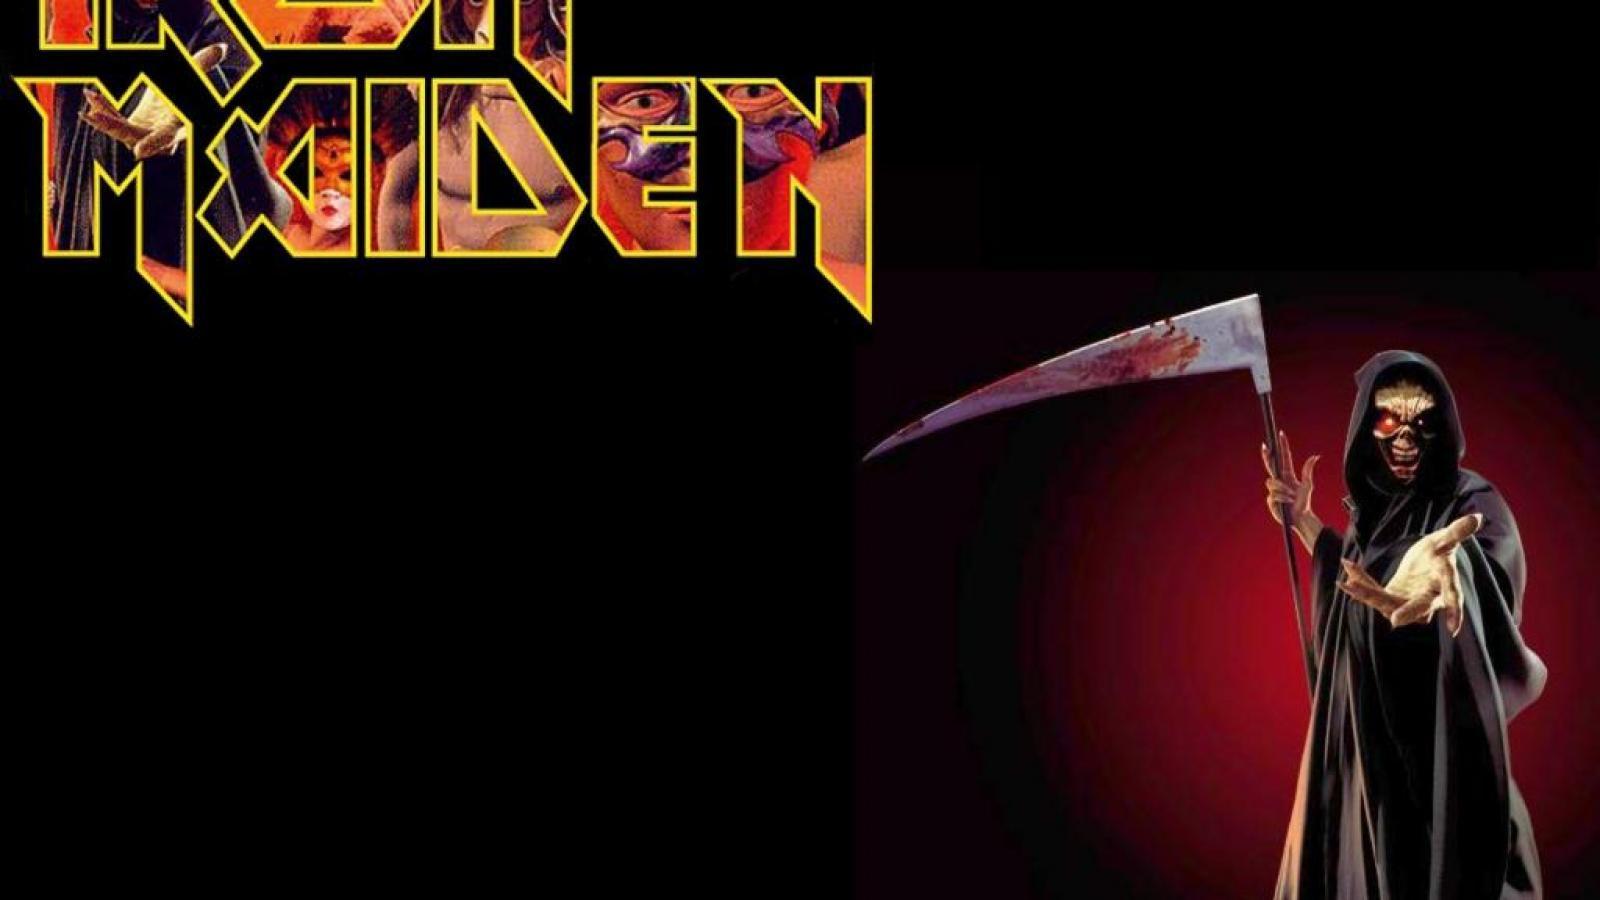 Iron Maiden Wallpaper Widescreen - WallpaperSafari